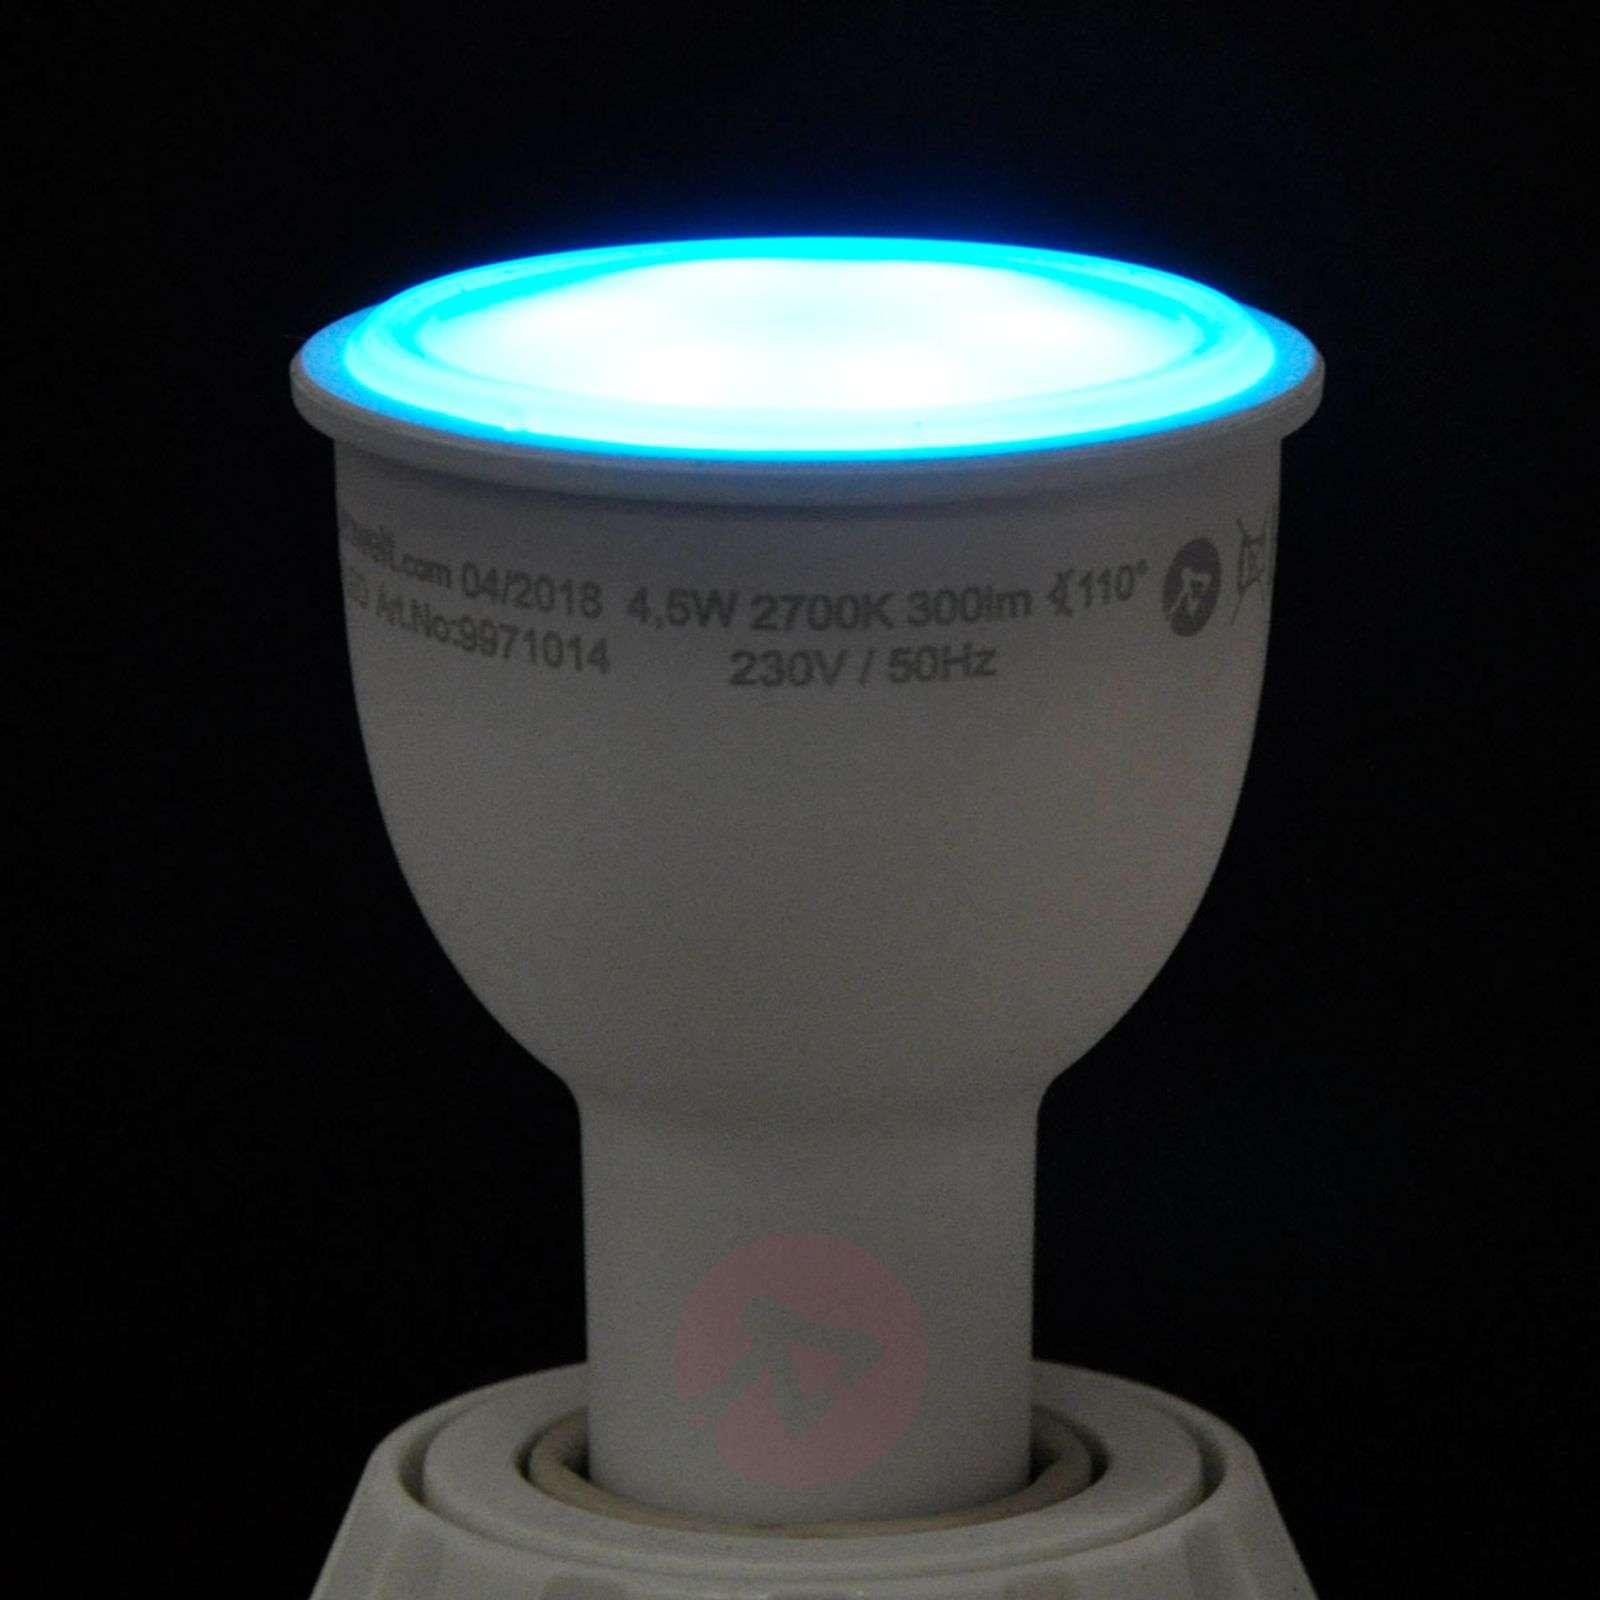 Lindby Smart LED-valonheitin 110degree GU10 4,5W RGB-9971014-01